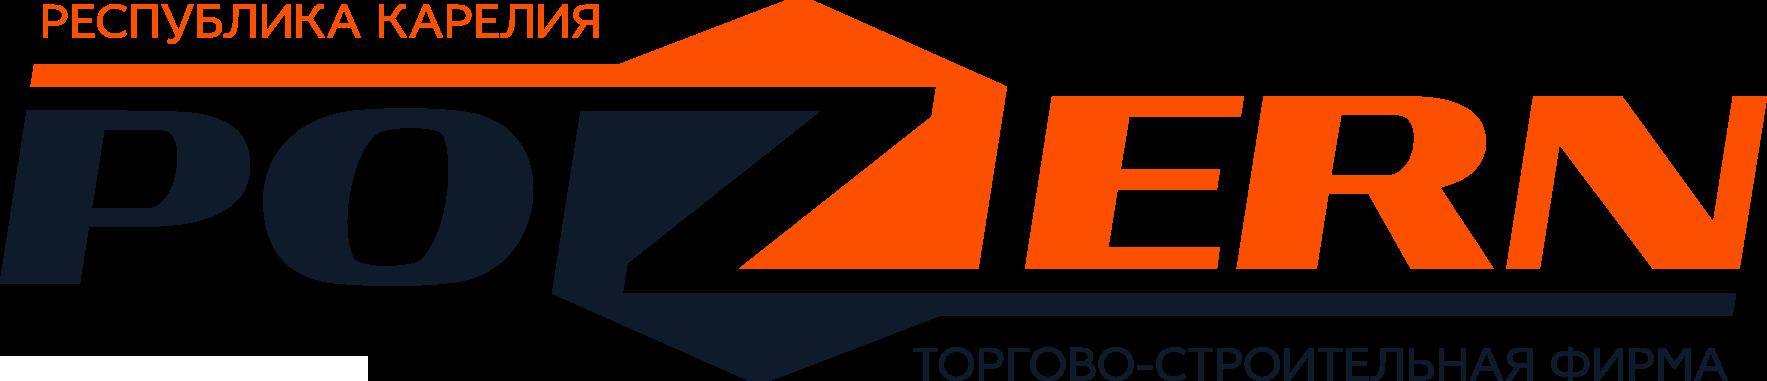 логотип фирмы pozern в карелии